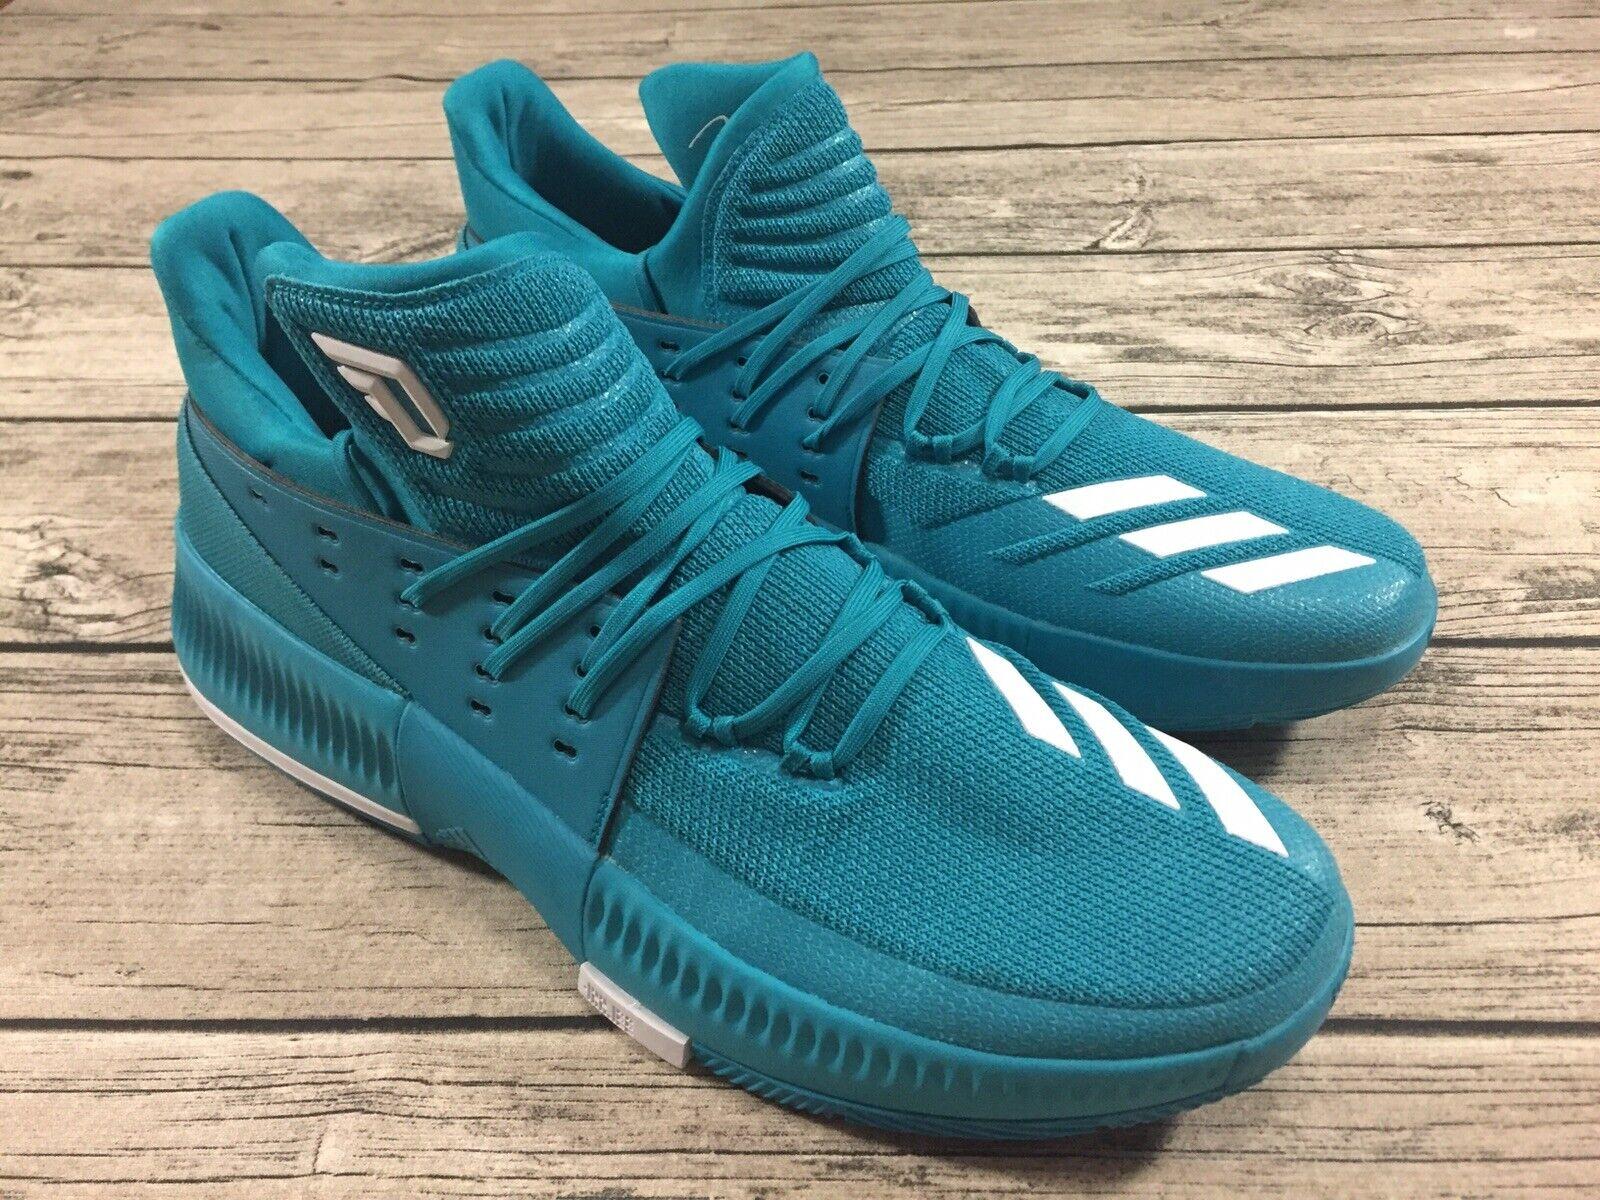 Adidas D Lillard 3 Basketball shoes Mens Size 16